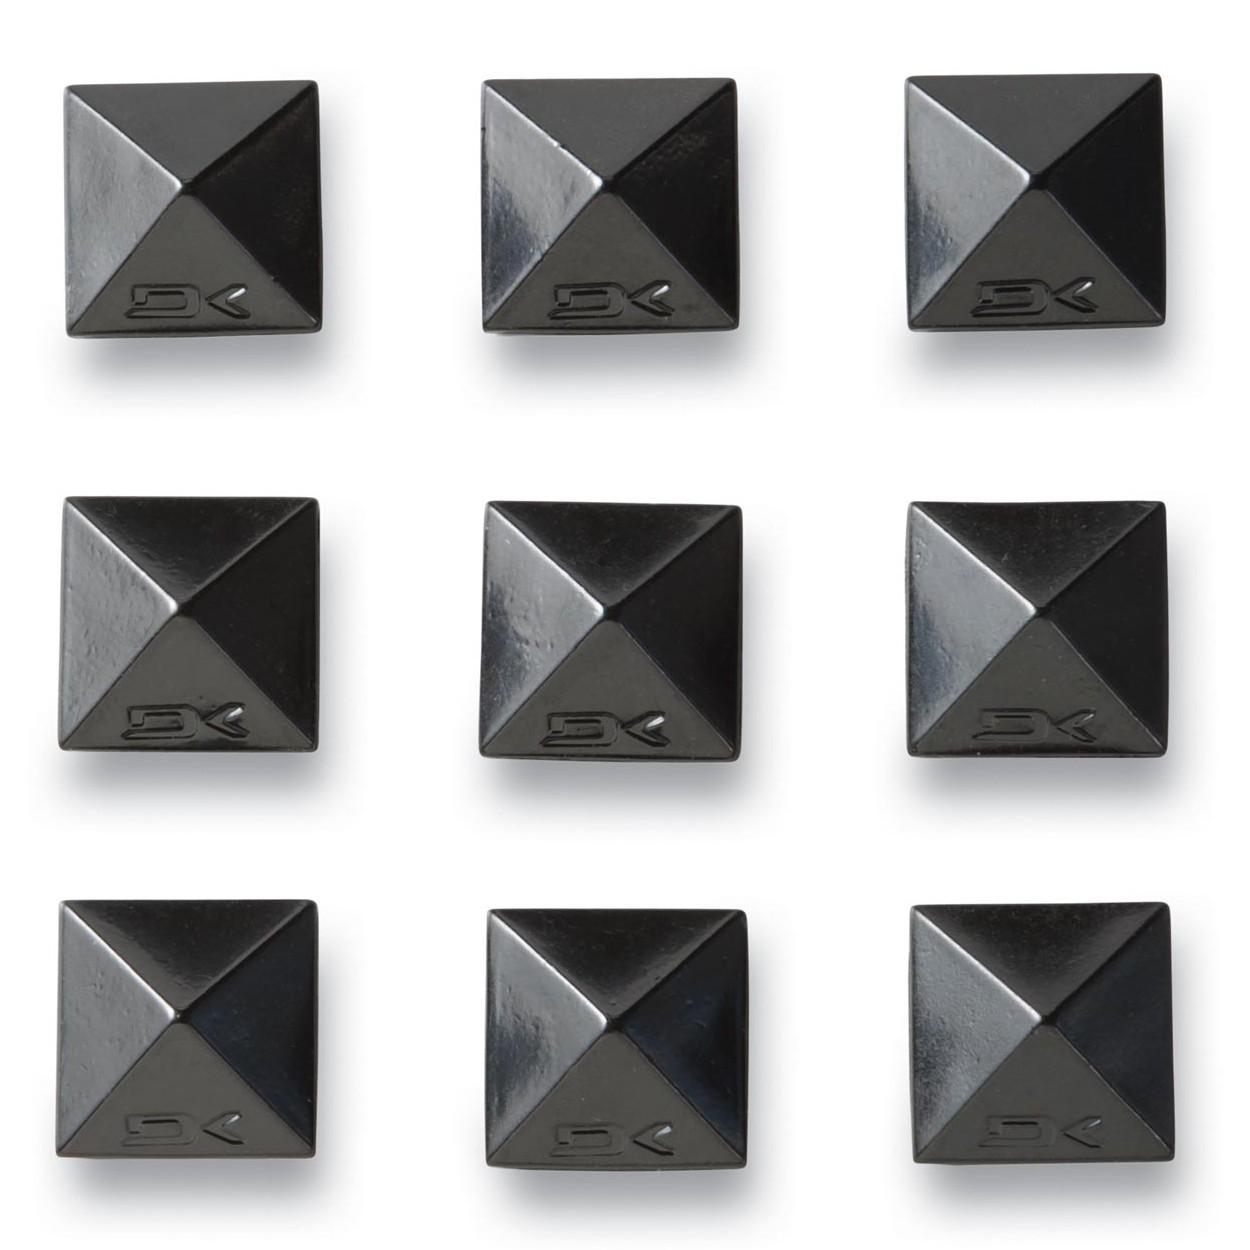 DAKINE Pyramid Studs Stomp Pad Black